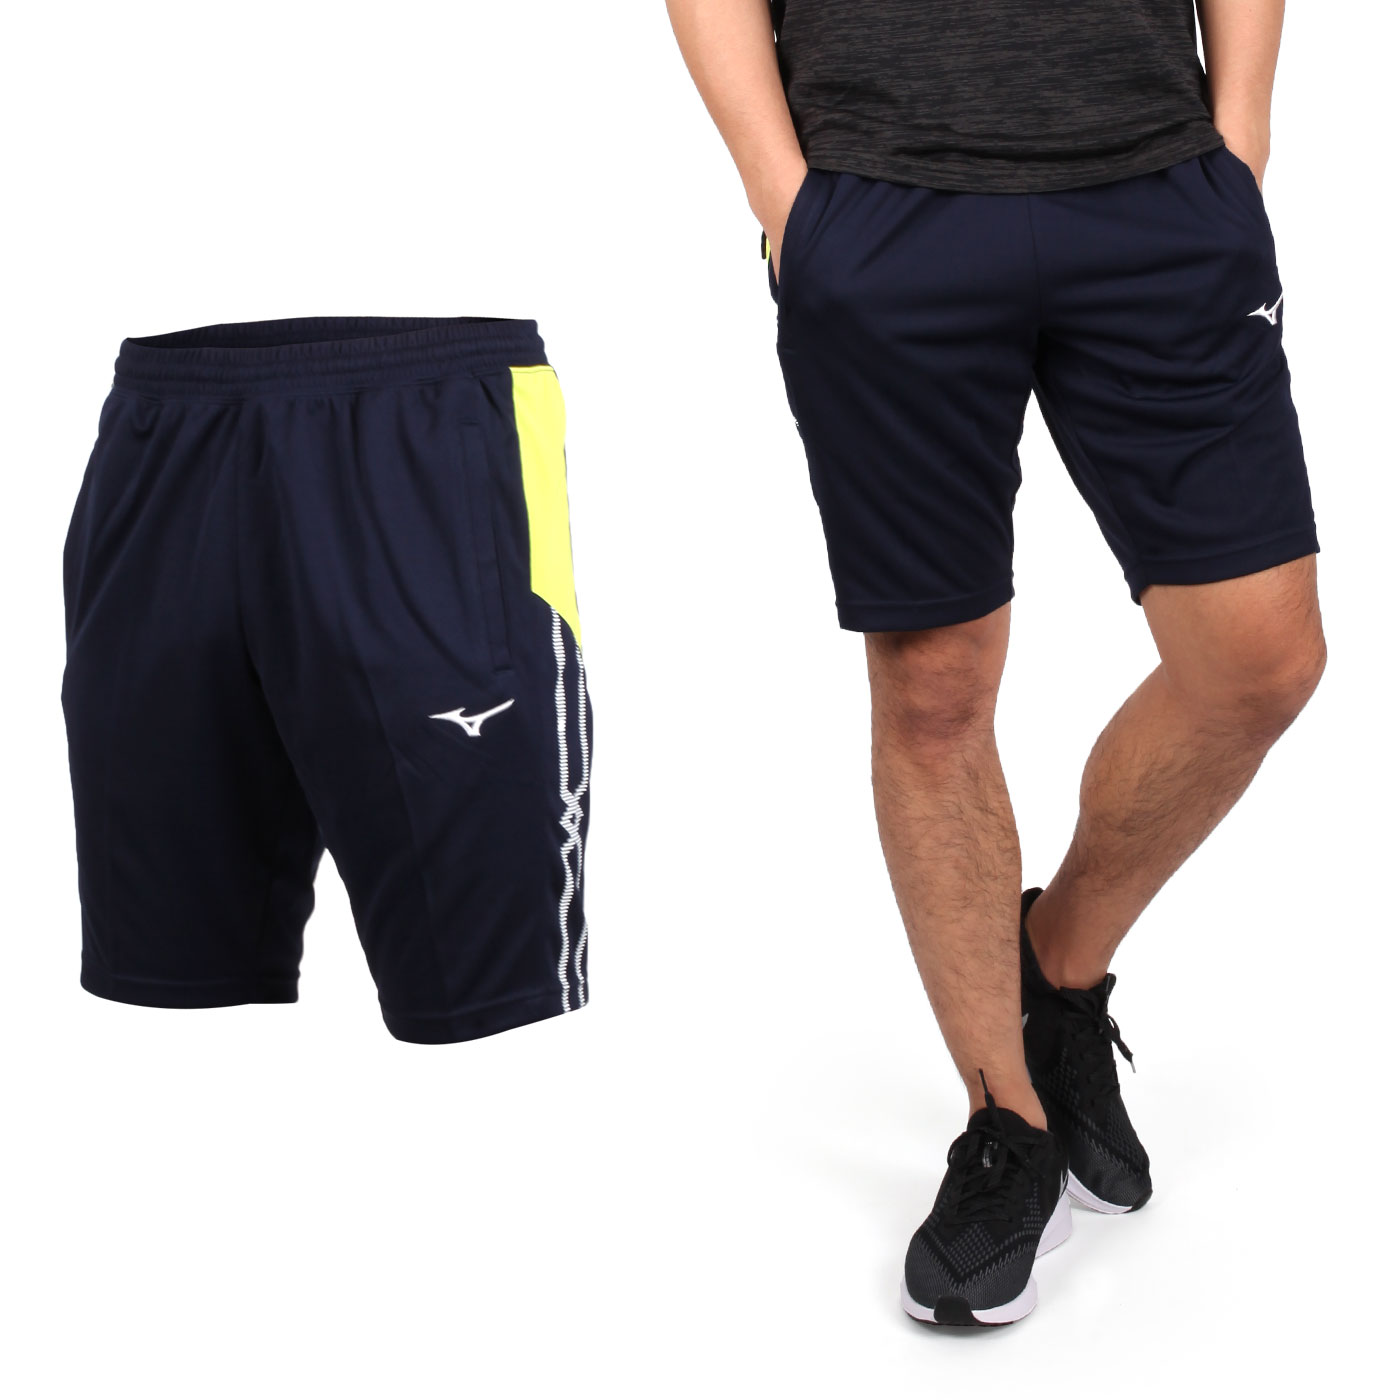 MIZUNO 男款針織運動短褲 32TB950614 - 丈青綠白